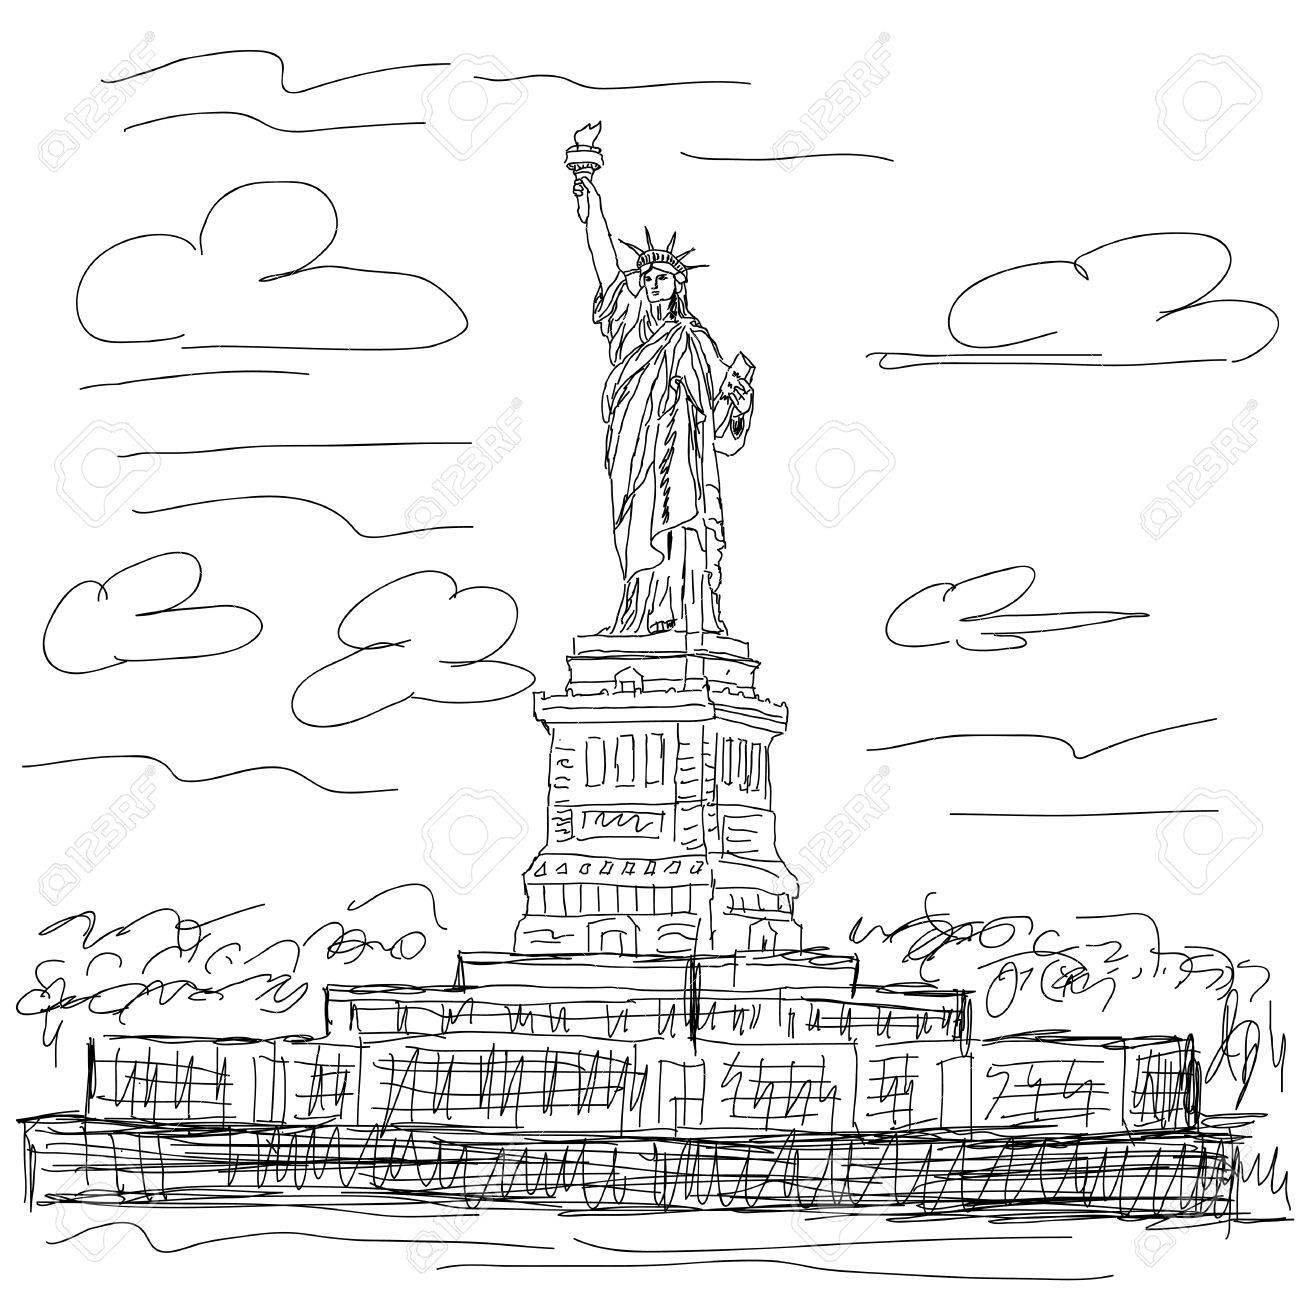 hand drawn illustration of famous tourist destination statue of liberty new york city usa. Stock Vector - 15956047